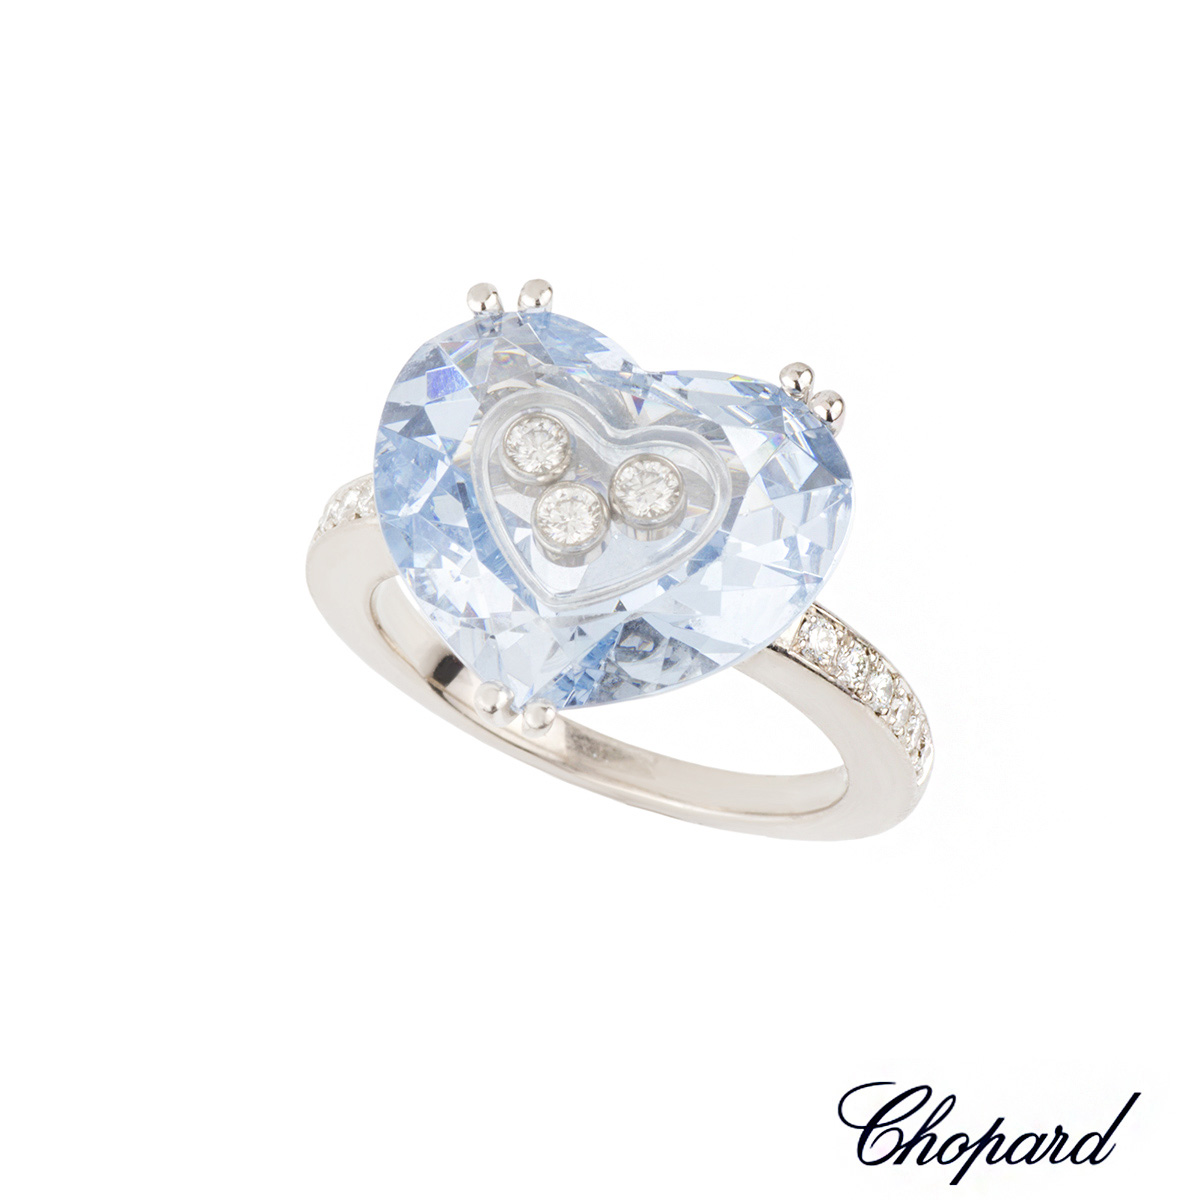 Chopard 18k White Gold Happy Diamonds Ring 82/6234/07